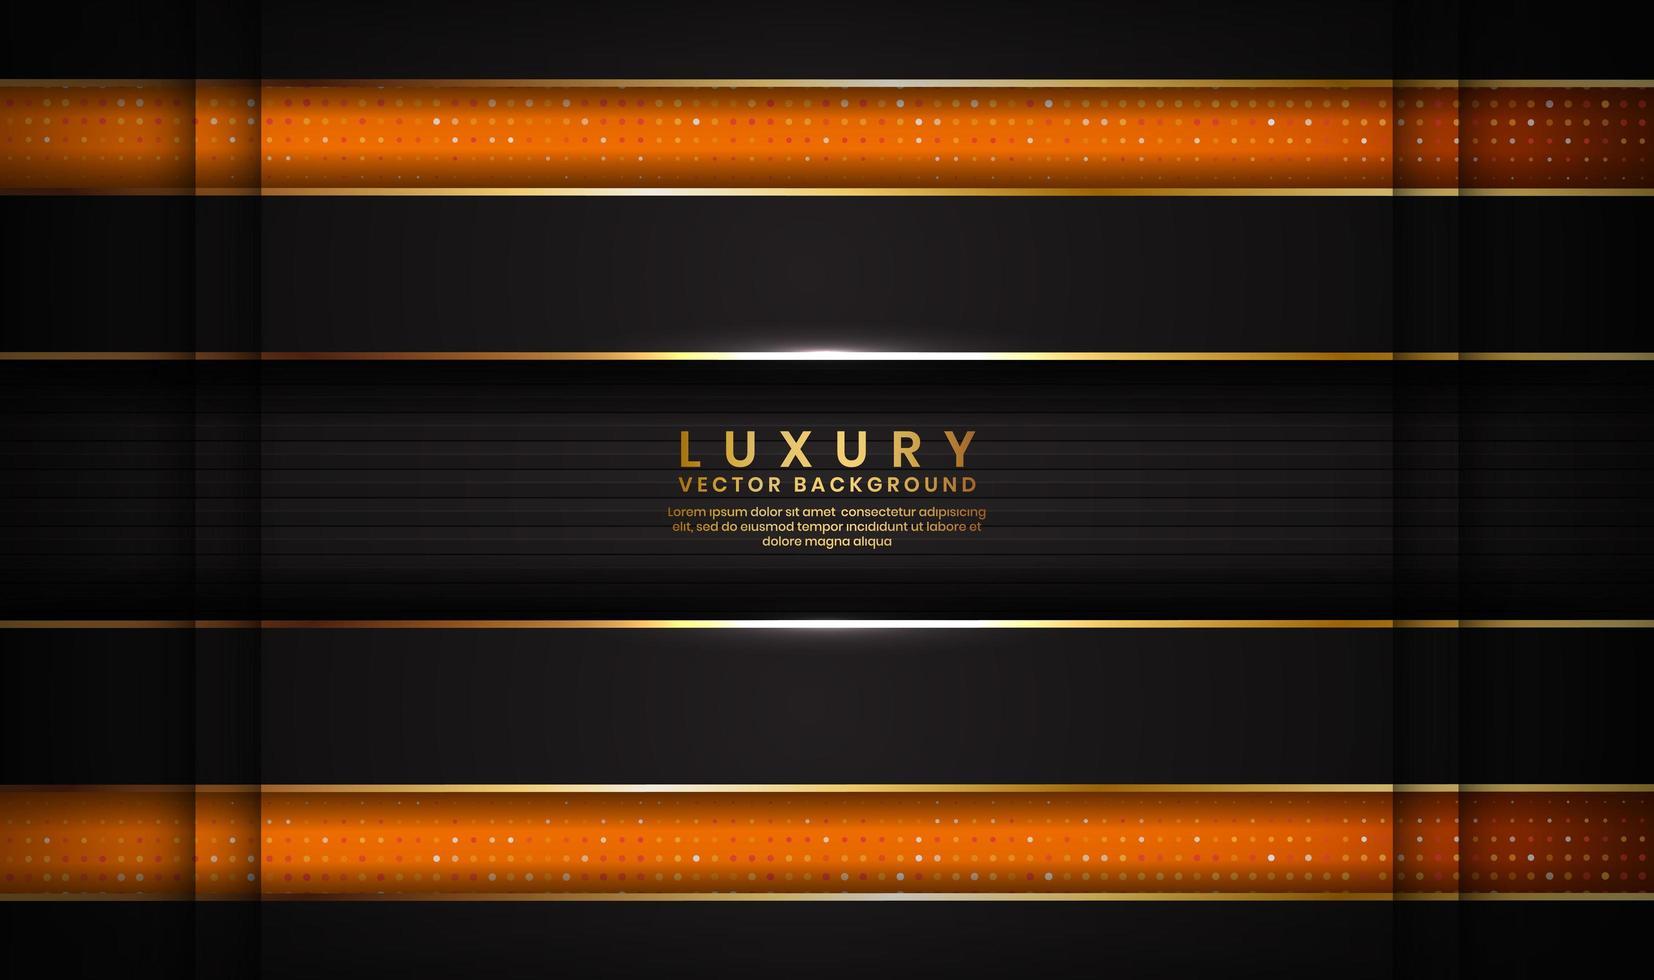 abstrakt mörk utrymme lyxig svart och orange bakgrund med gyllene linjer vektor